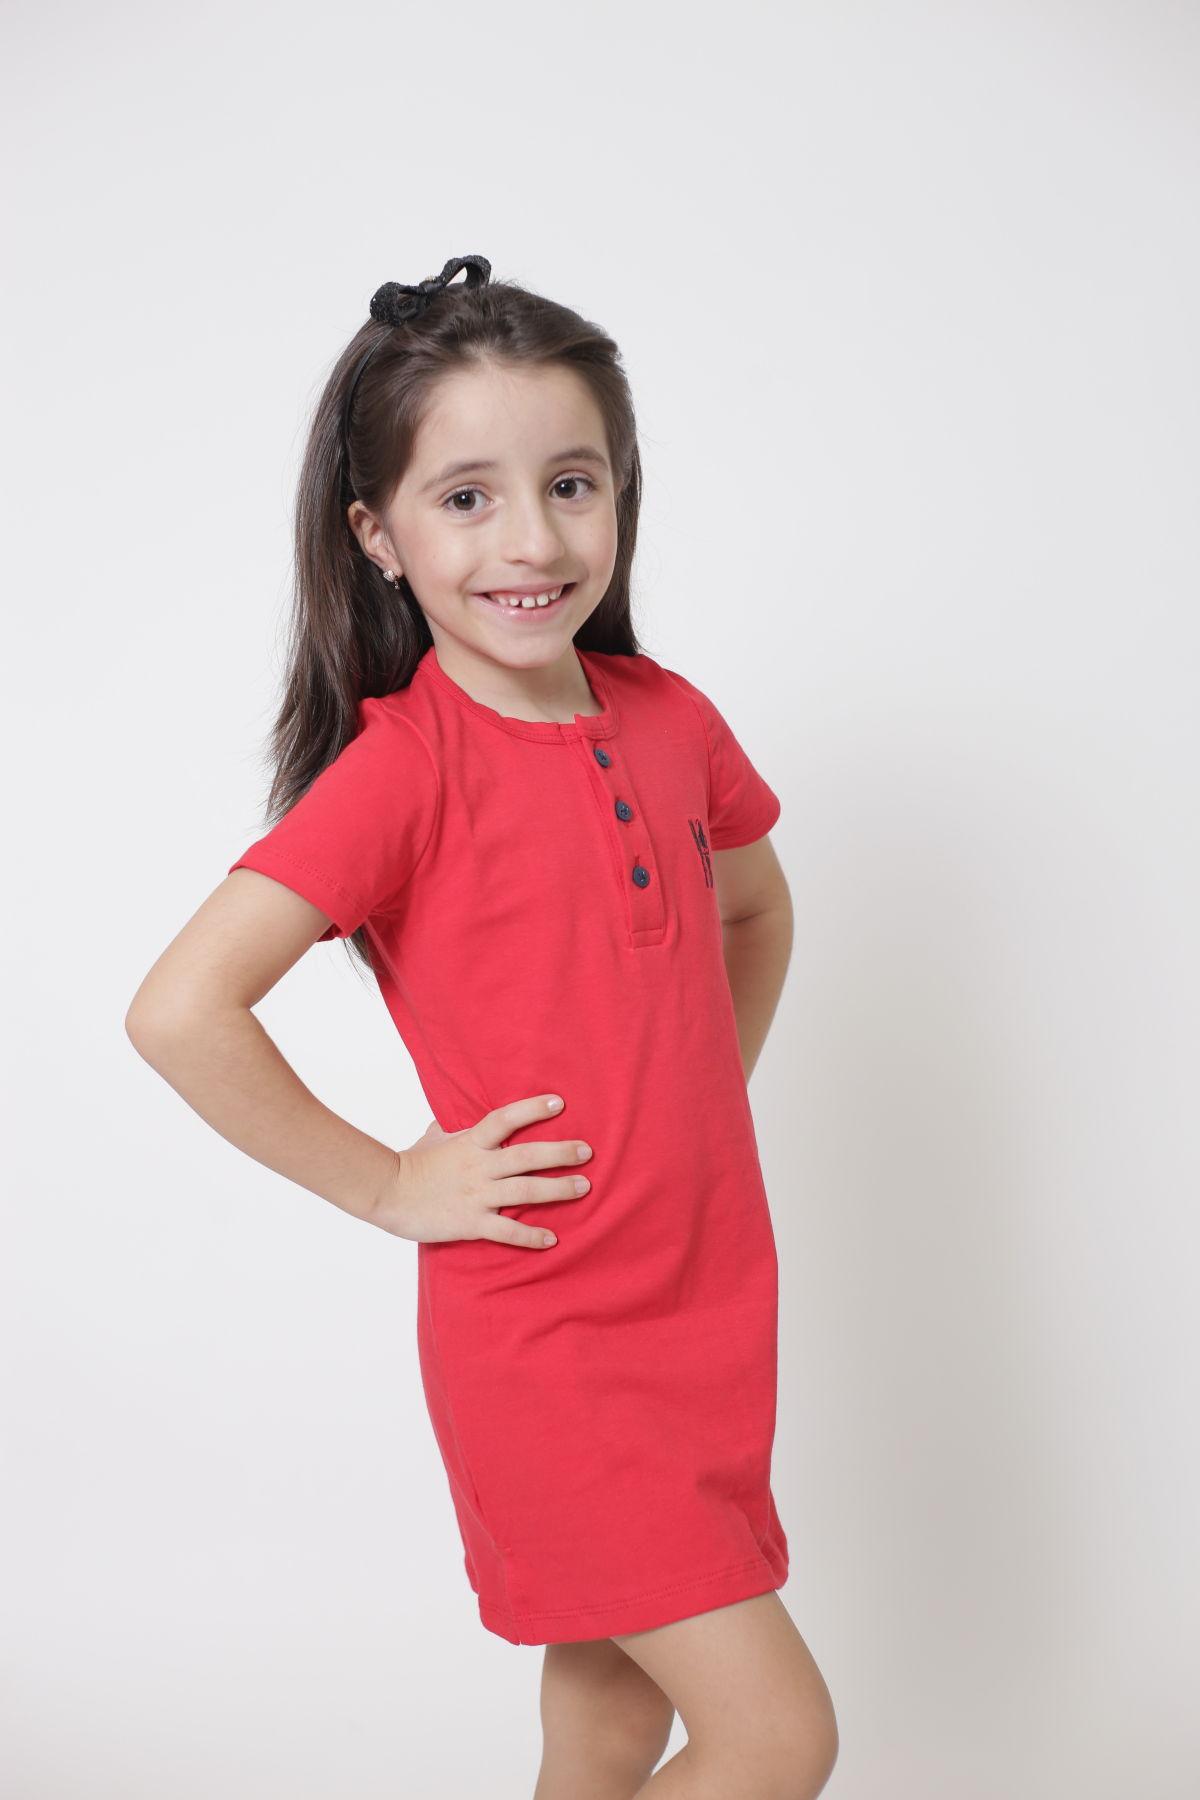 Vestido Henley Infantil Vermelho  - Heitor Fashion Brazil